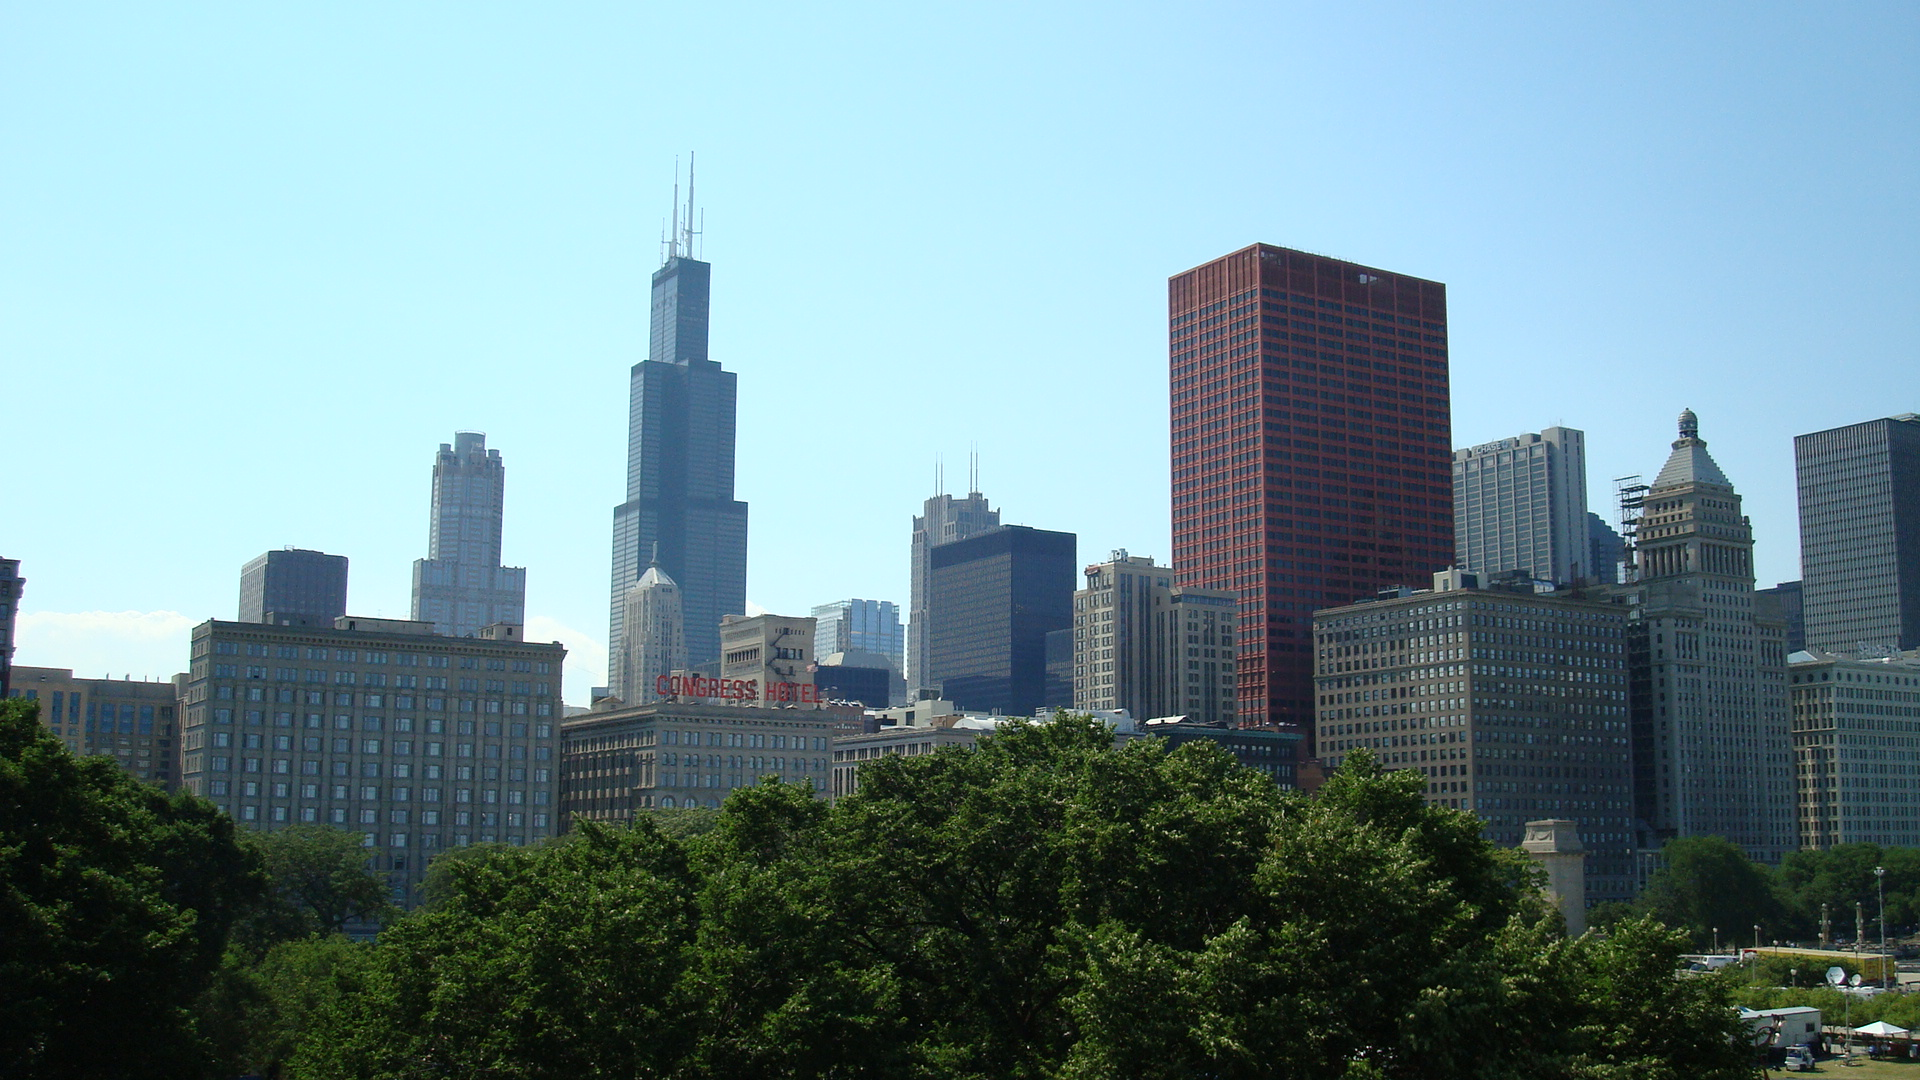 66 chicago skyline wallpapers on wallpapersafari - Chicago skyline wallpaper 1920x1080 ...